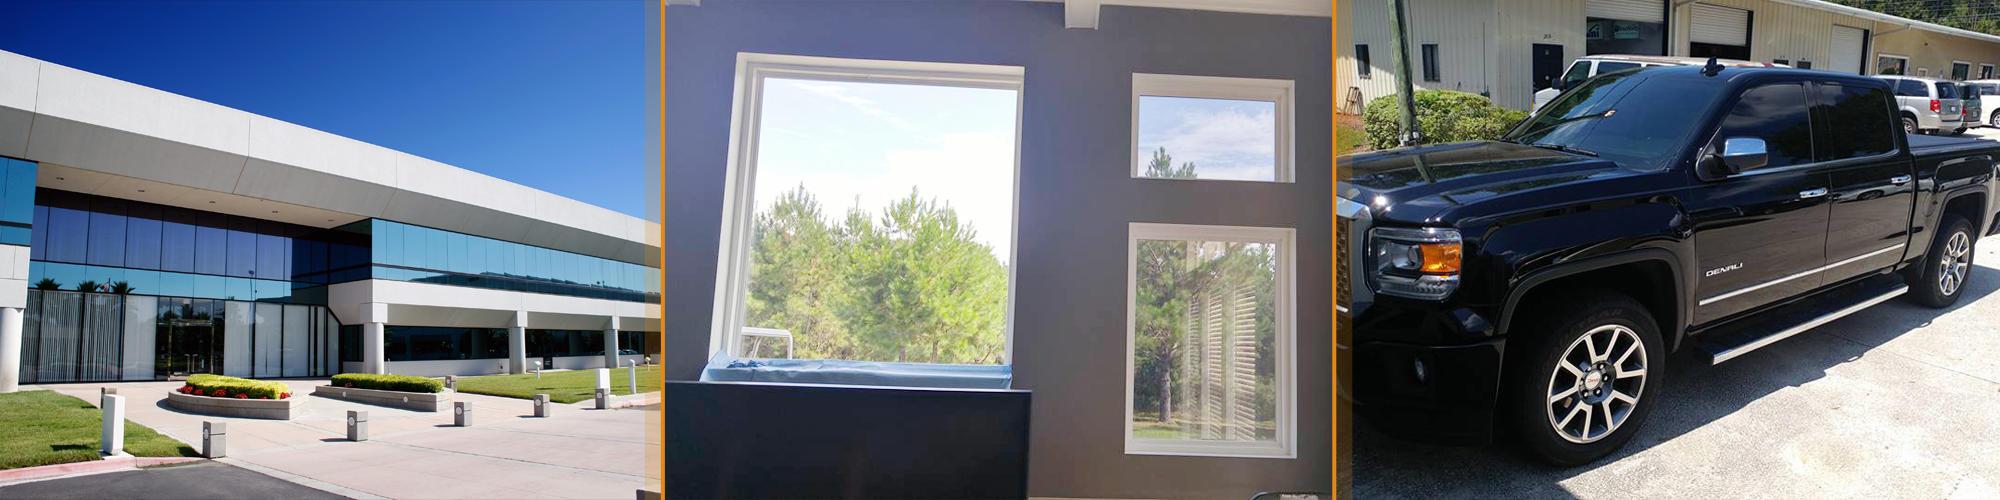 Solar Shade Window Tint image 0